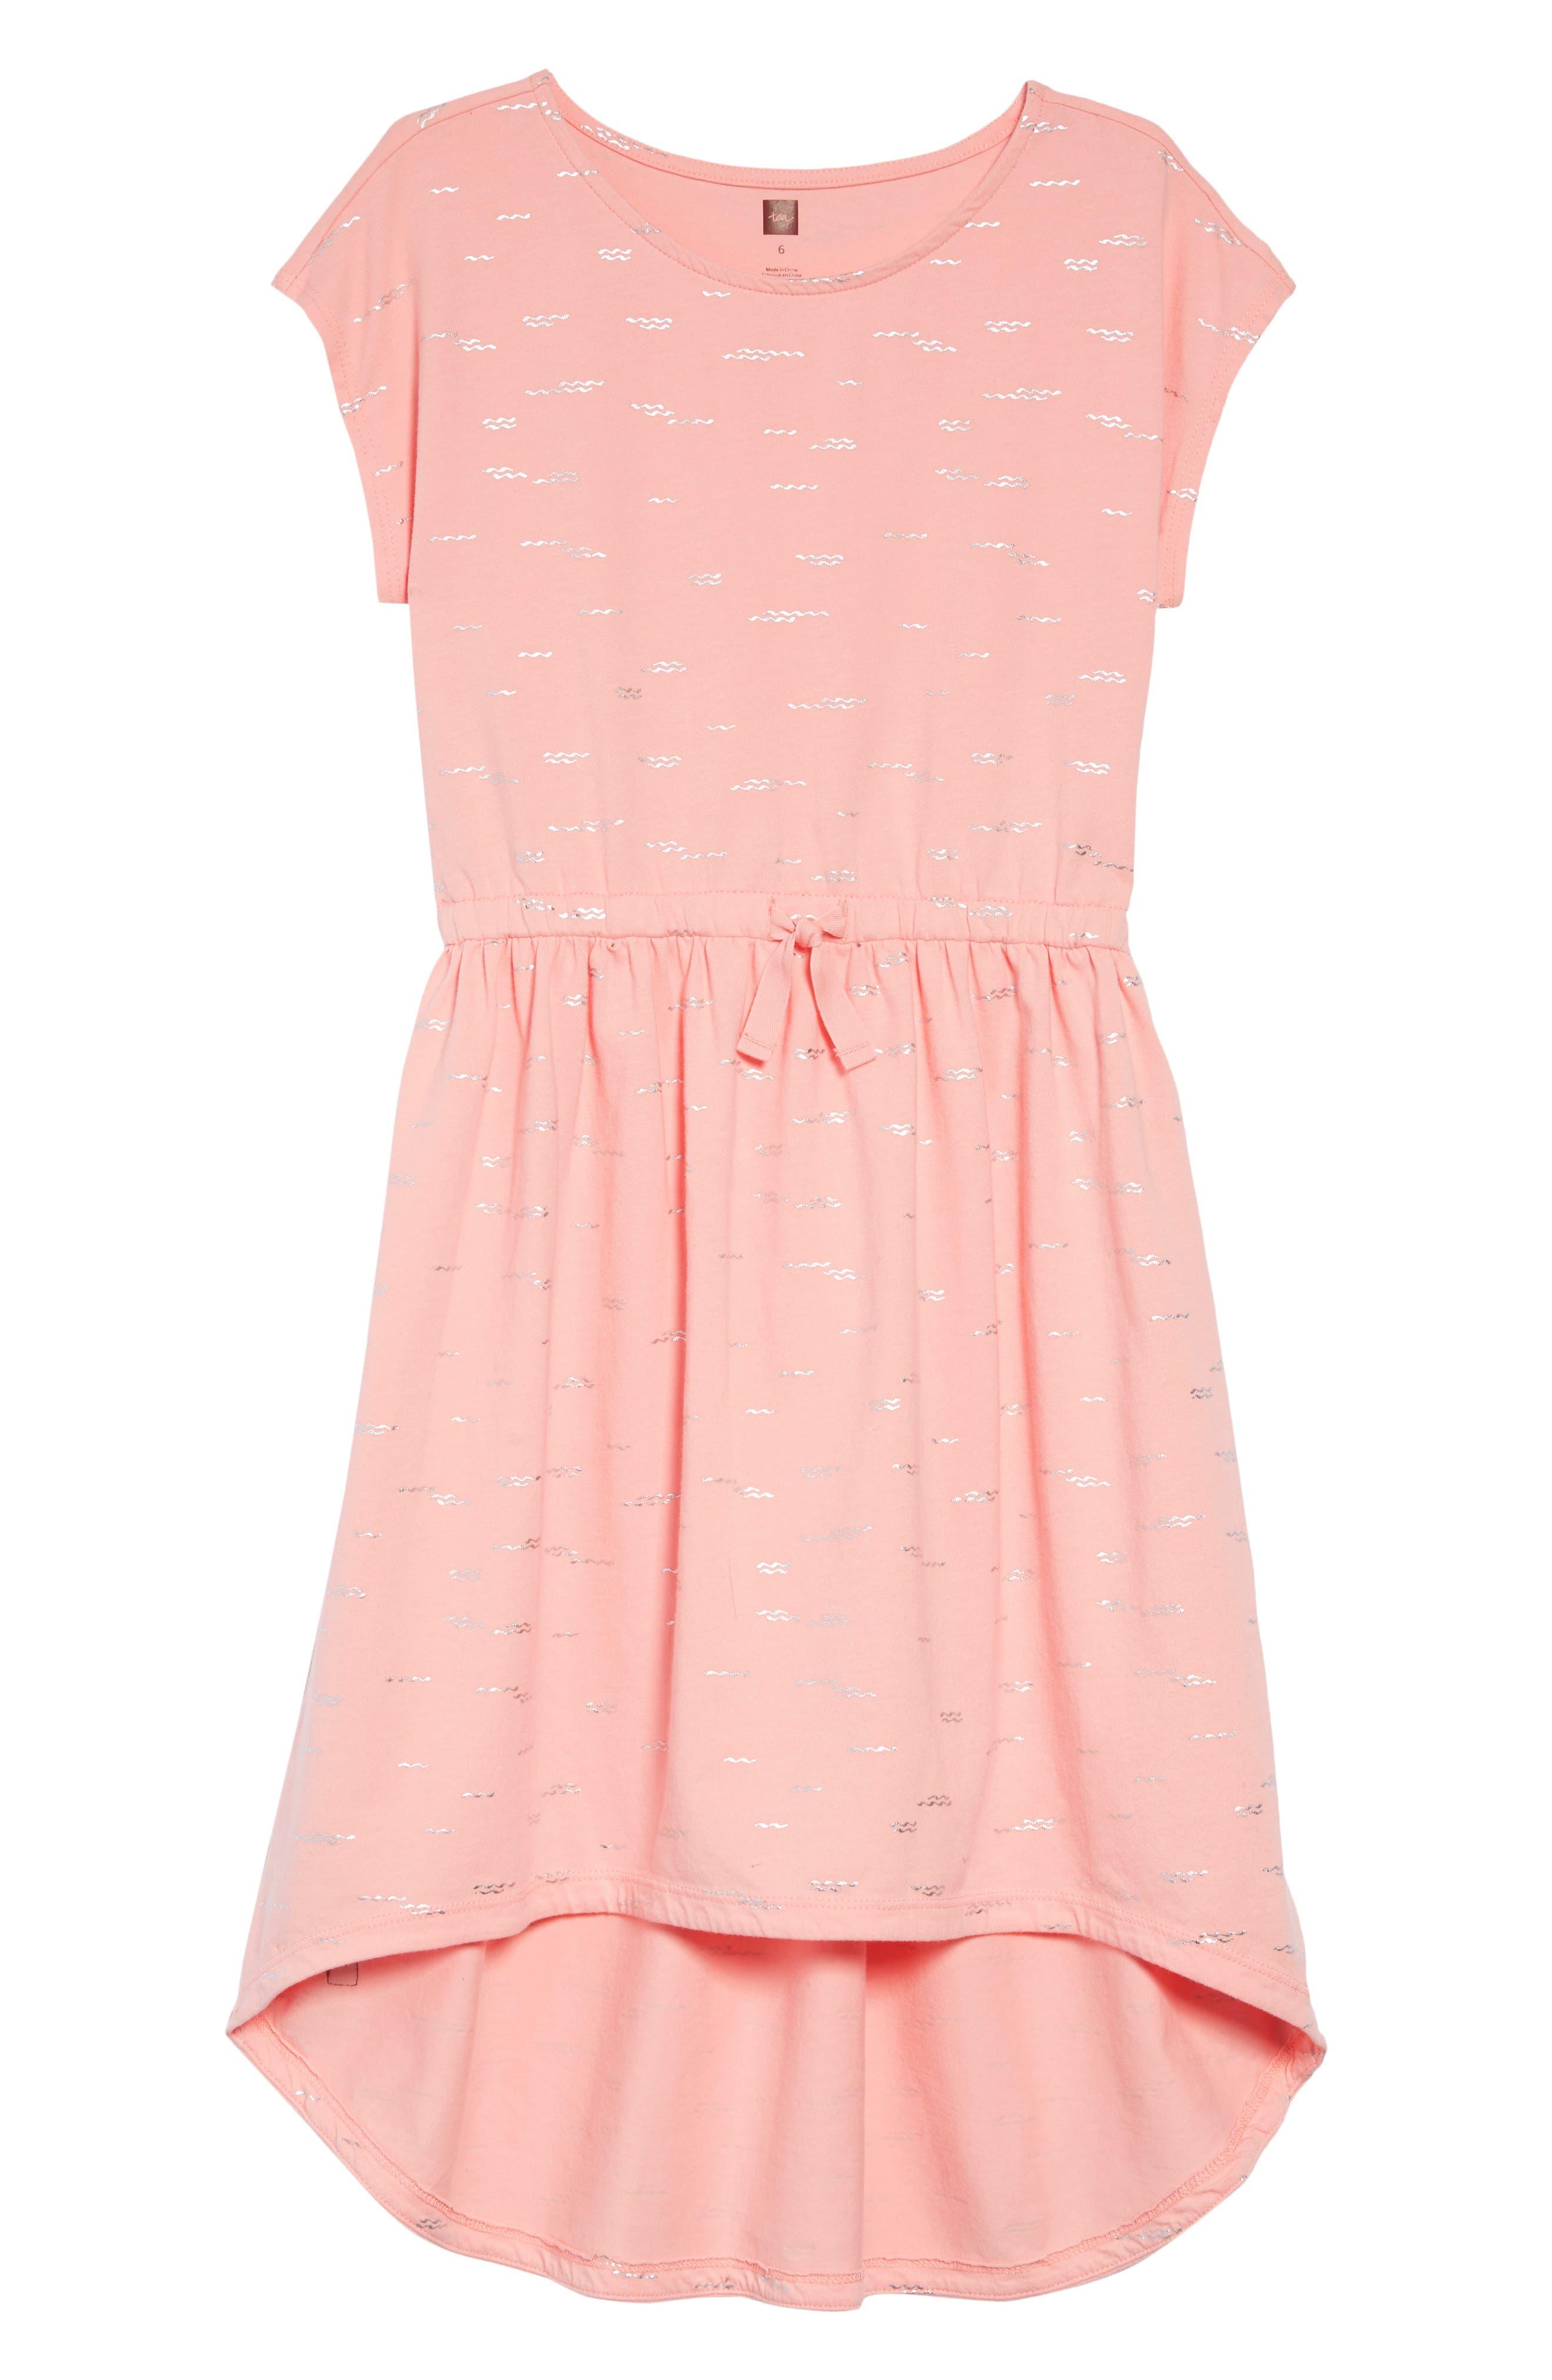 Sparkle High/Low Dress, Main, color, GLIMMERING WAVES - TEACUP